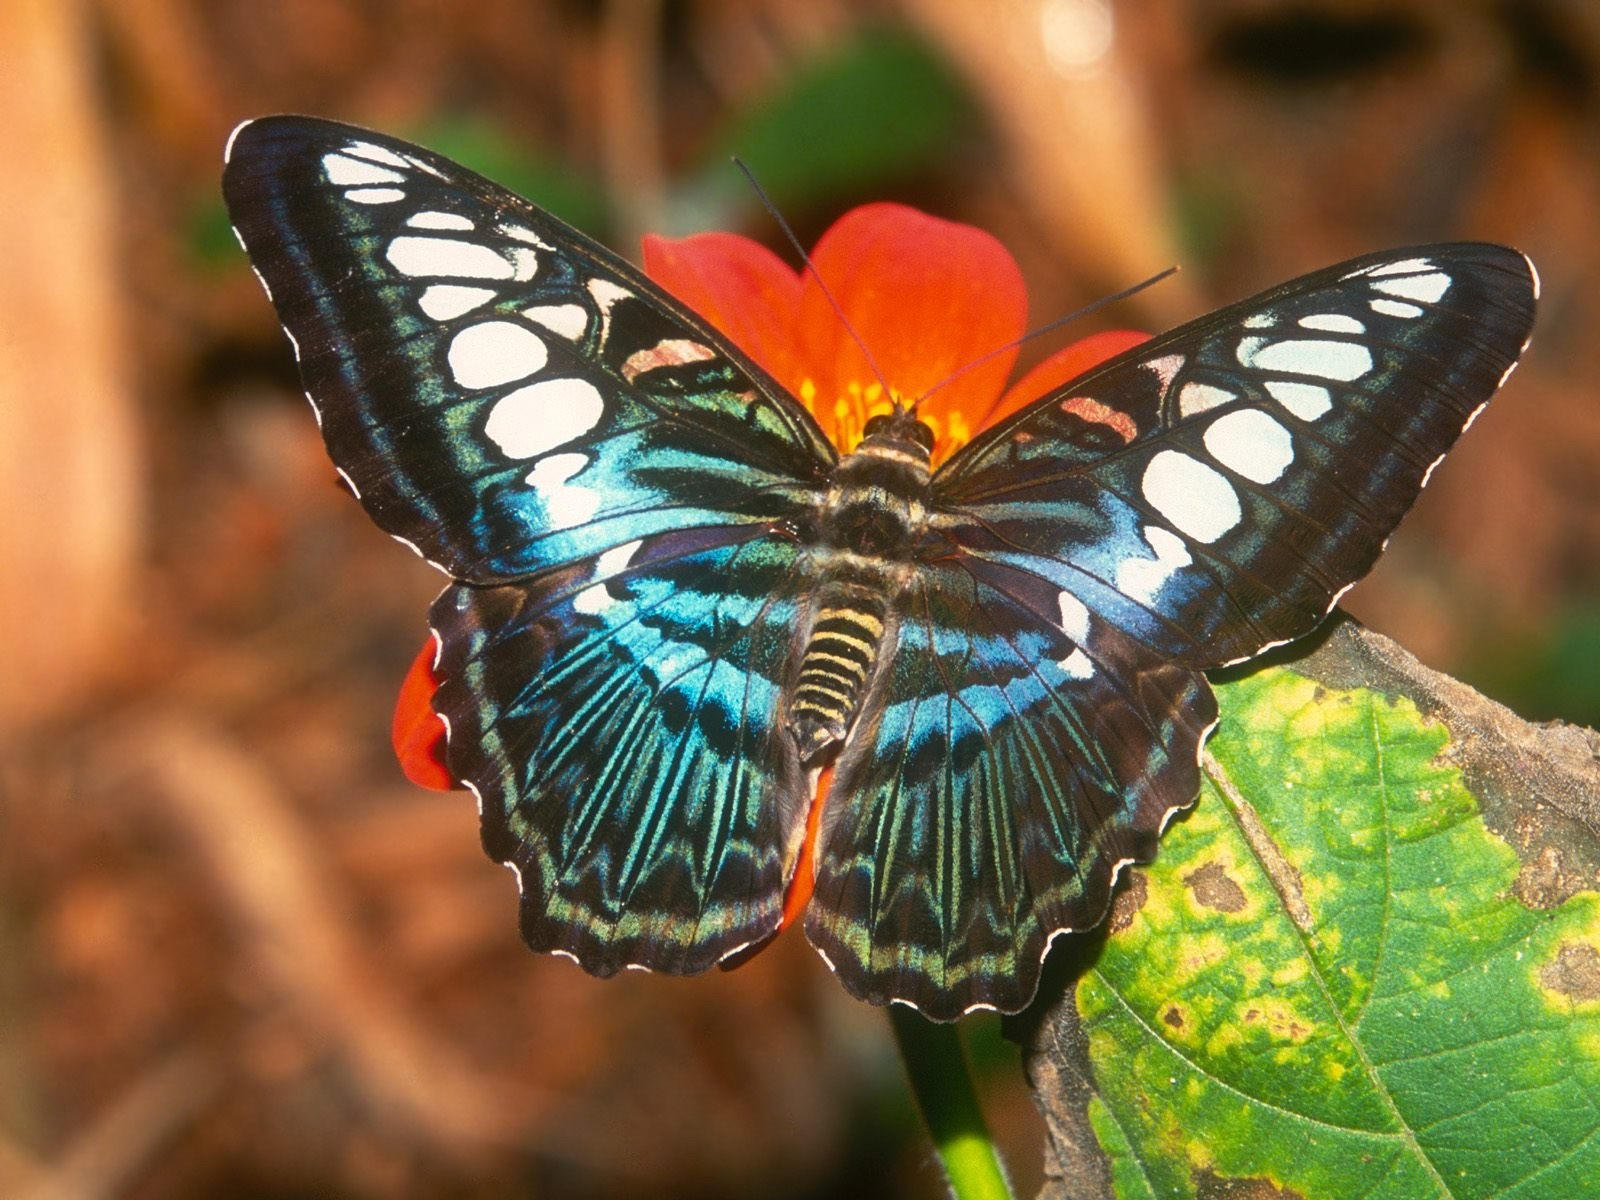 Бабочка темной окраски